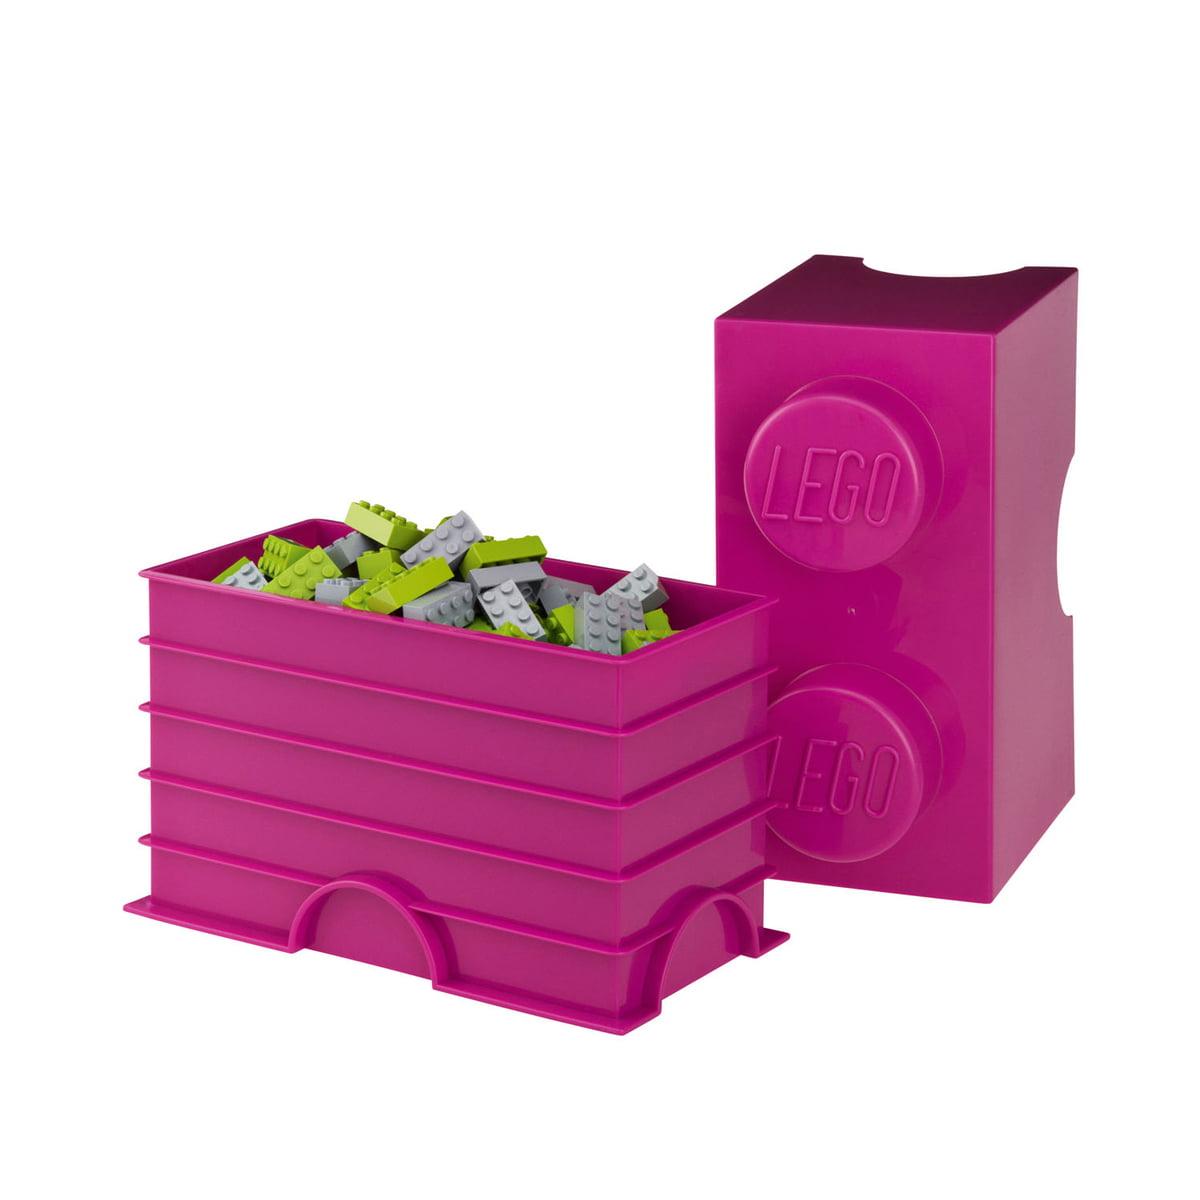 storage brick 2 by lego in our interior design shop. Black Bedroom Furniture Sets. Home Design Ideas